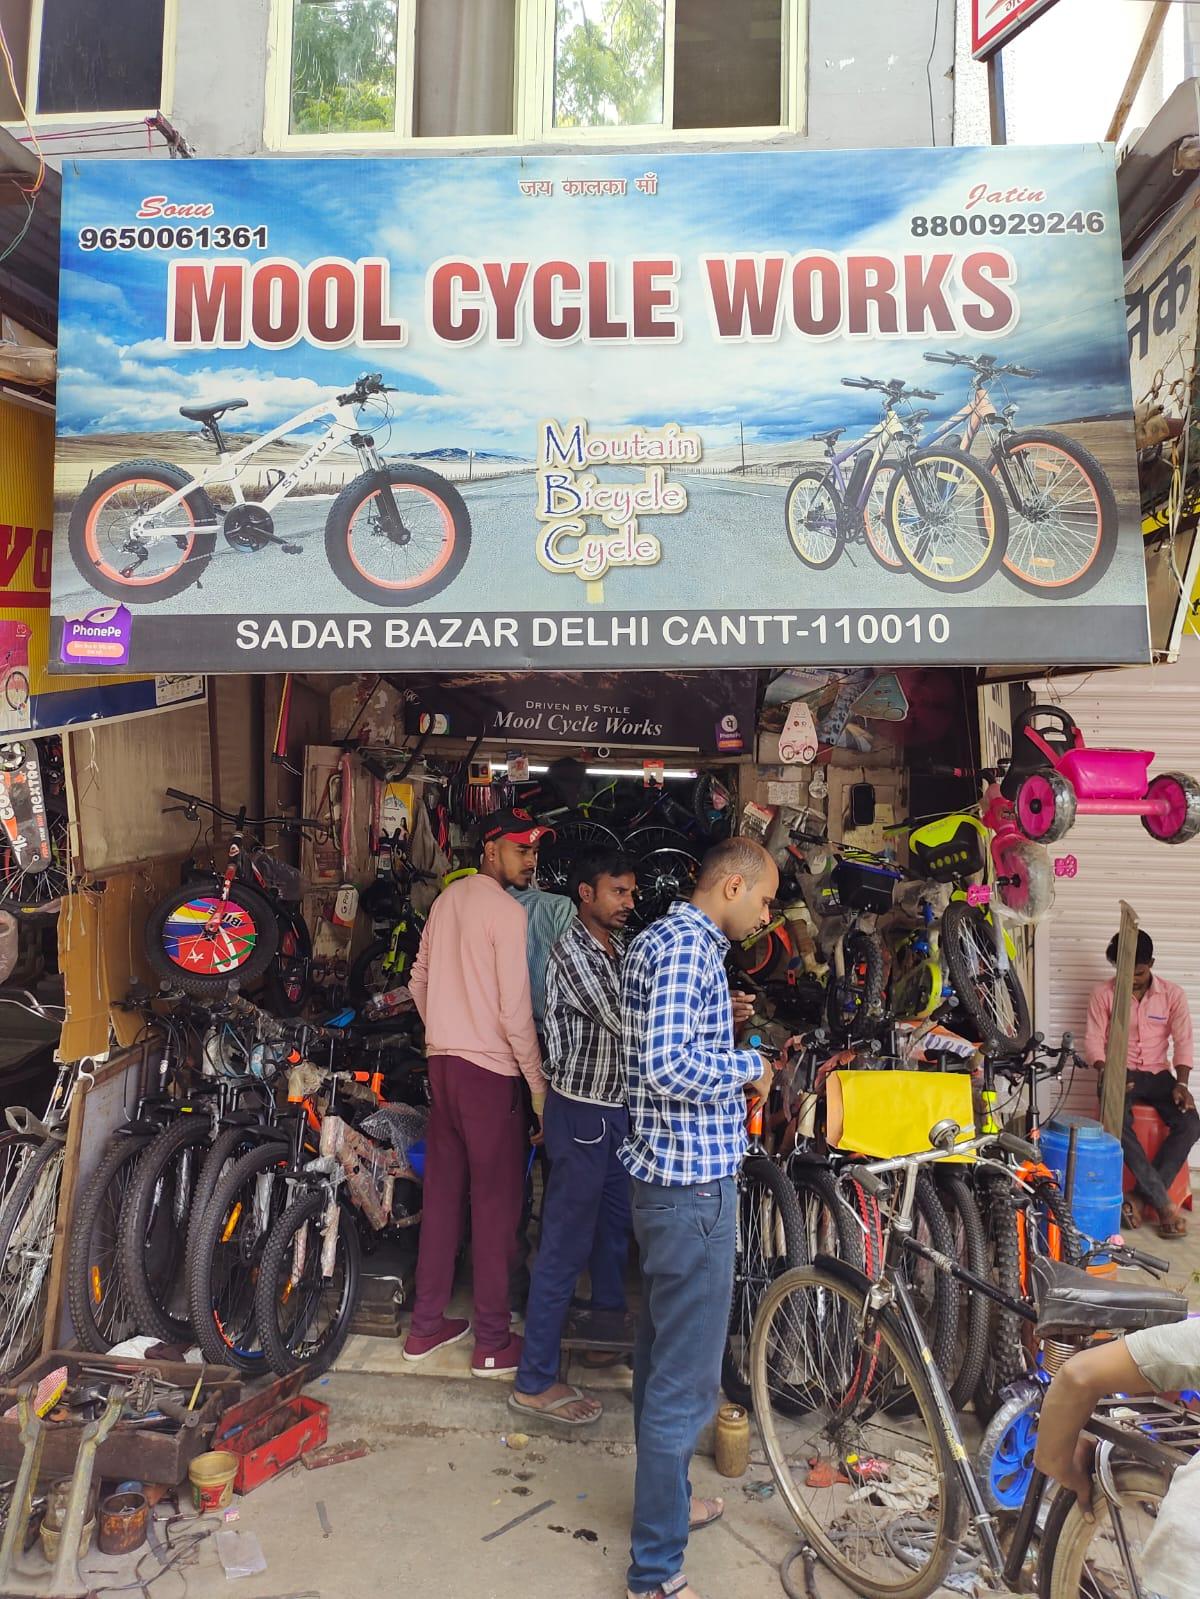 mool cycle works